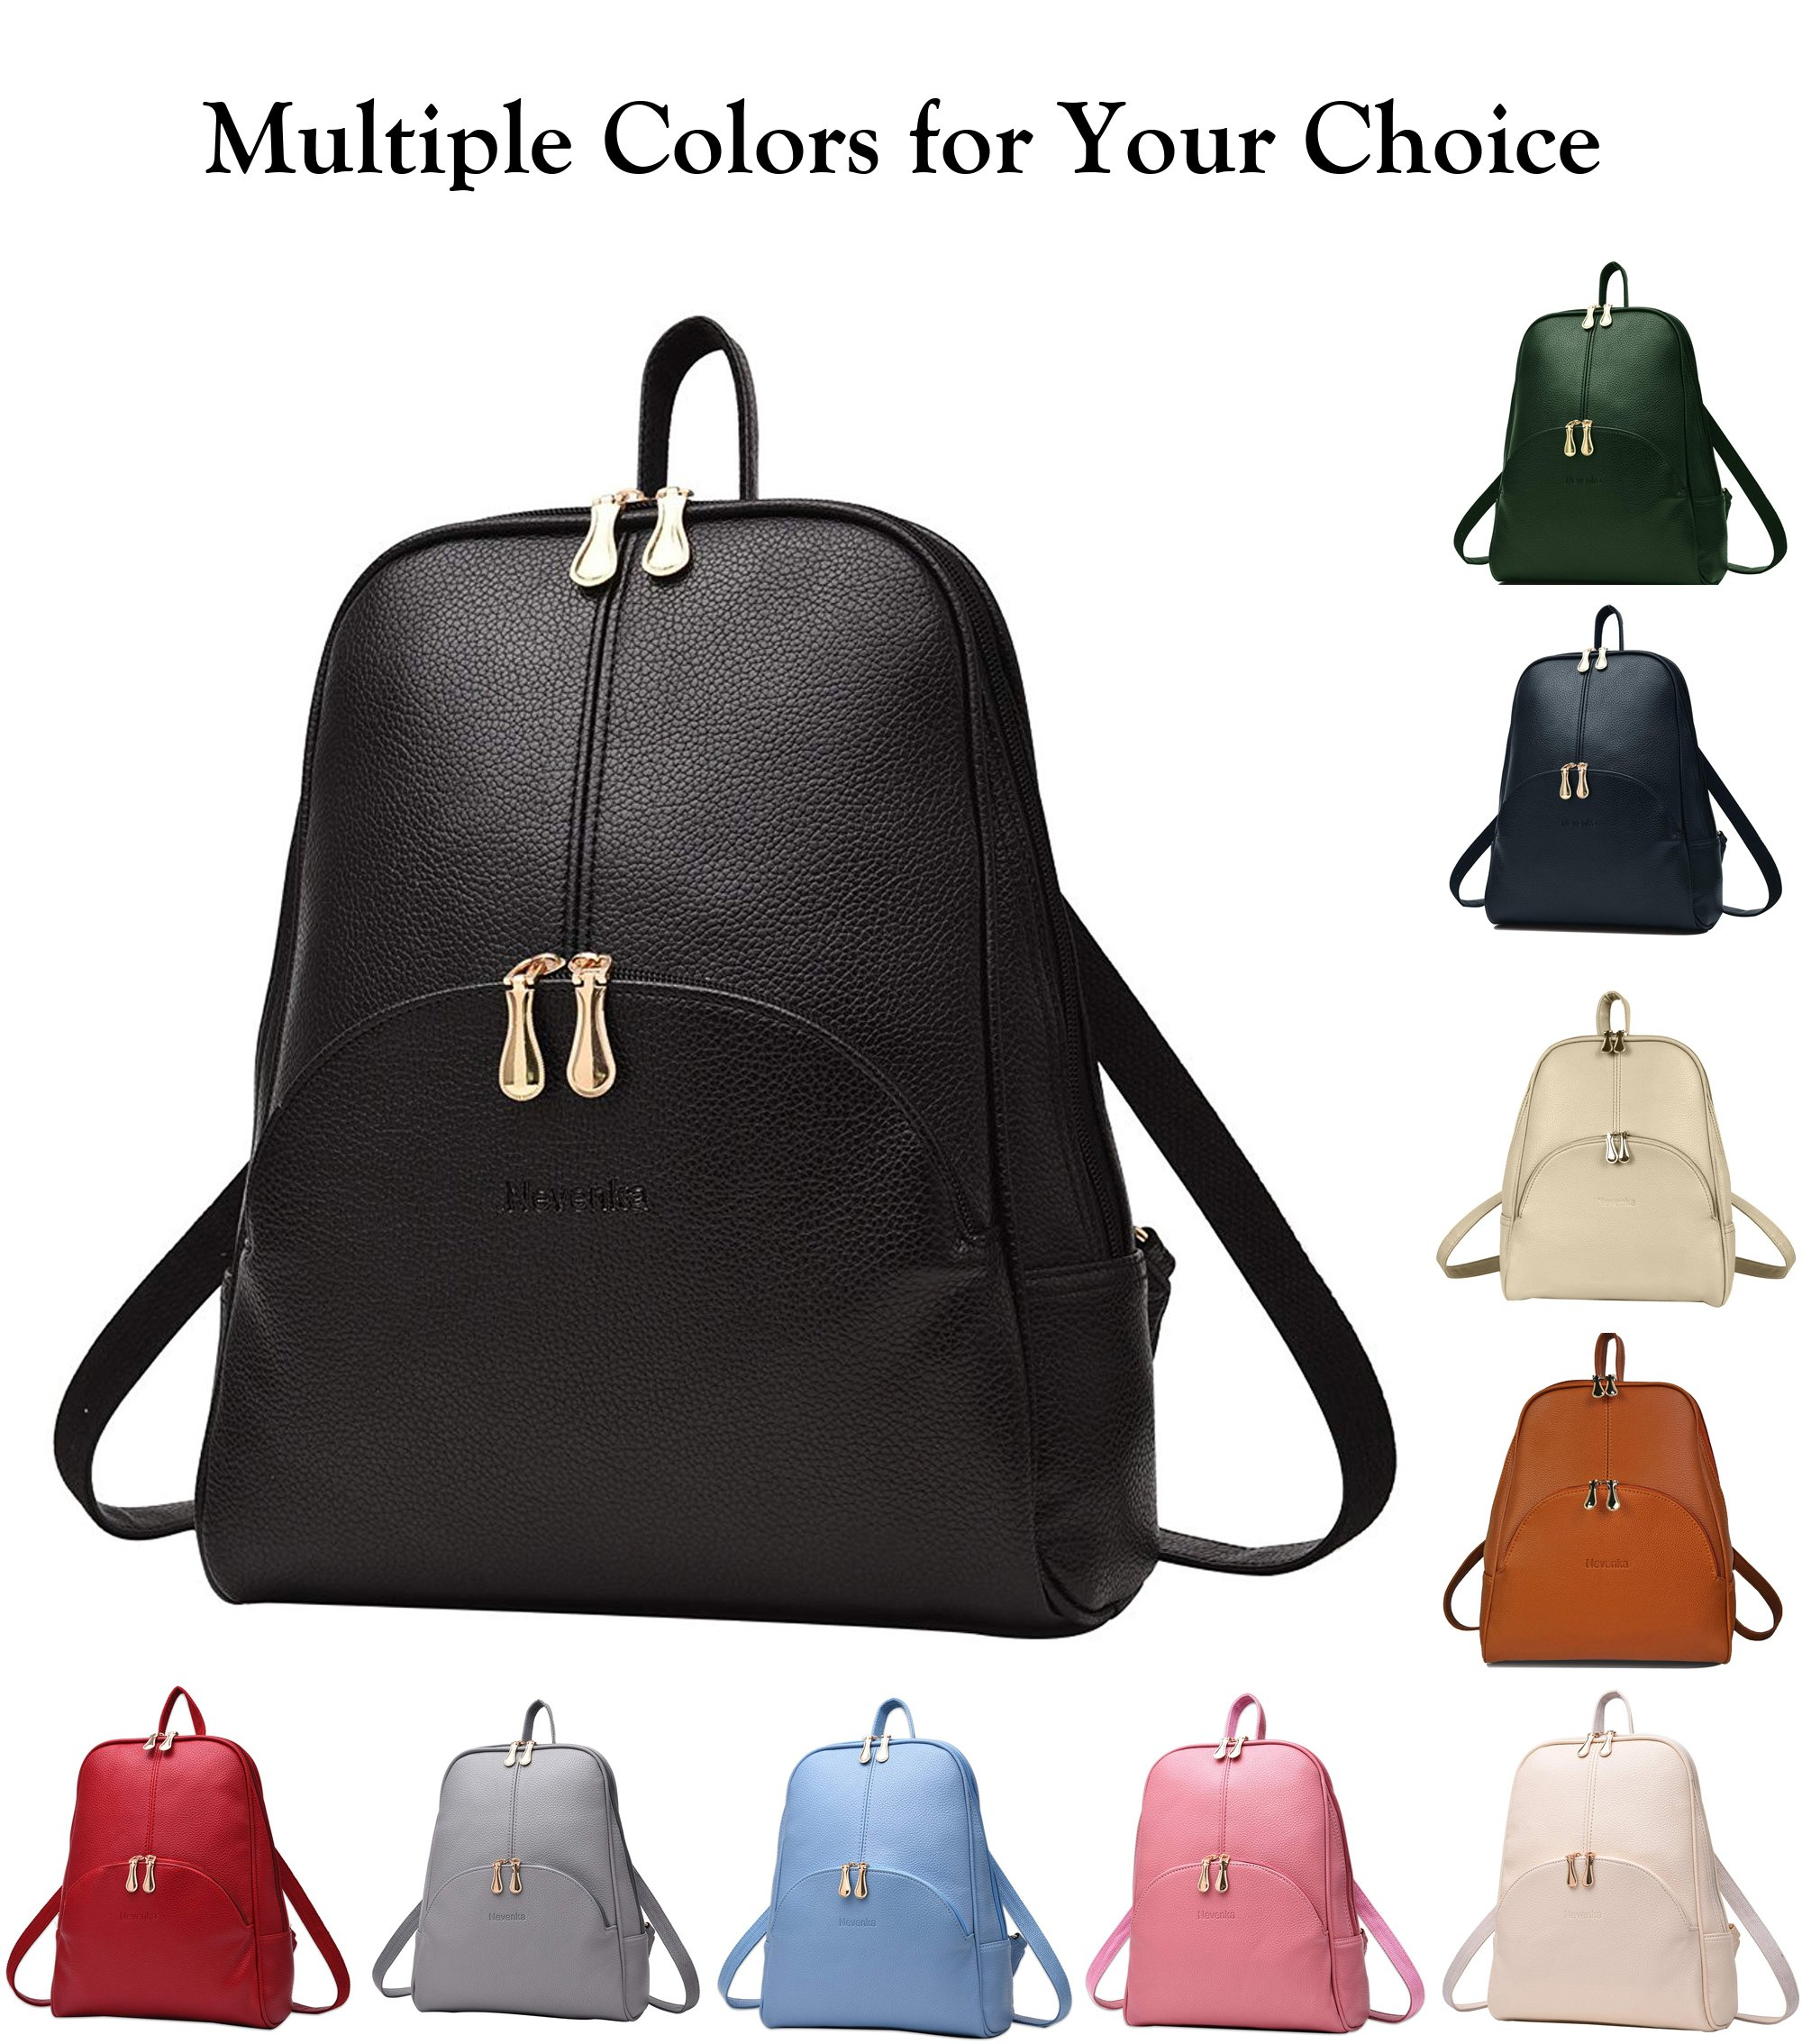 Nevenka Brand Women Bags Backpack Purse PU Leather Zipper Bags Casual Backpacks Shoulder Bags (Autumn Maple) by Nevenka (Image #7)